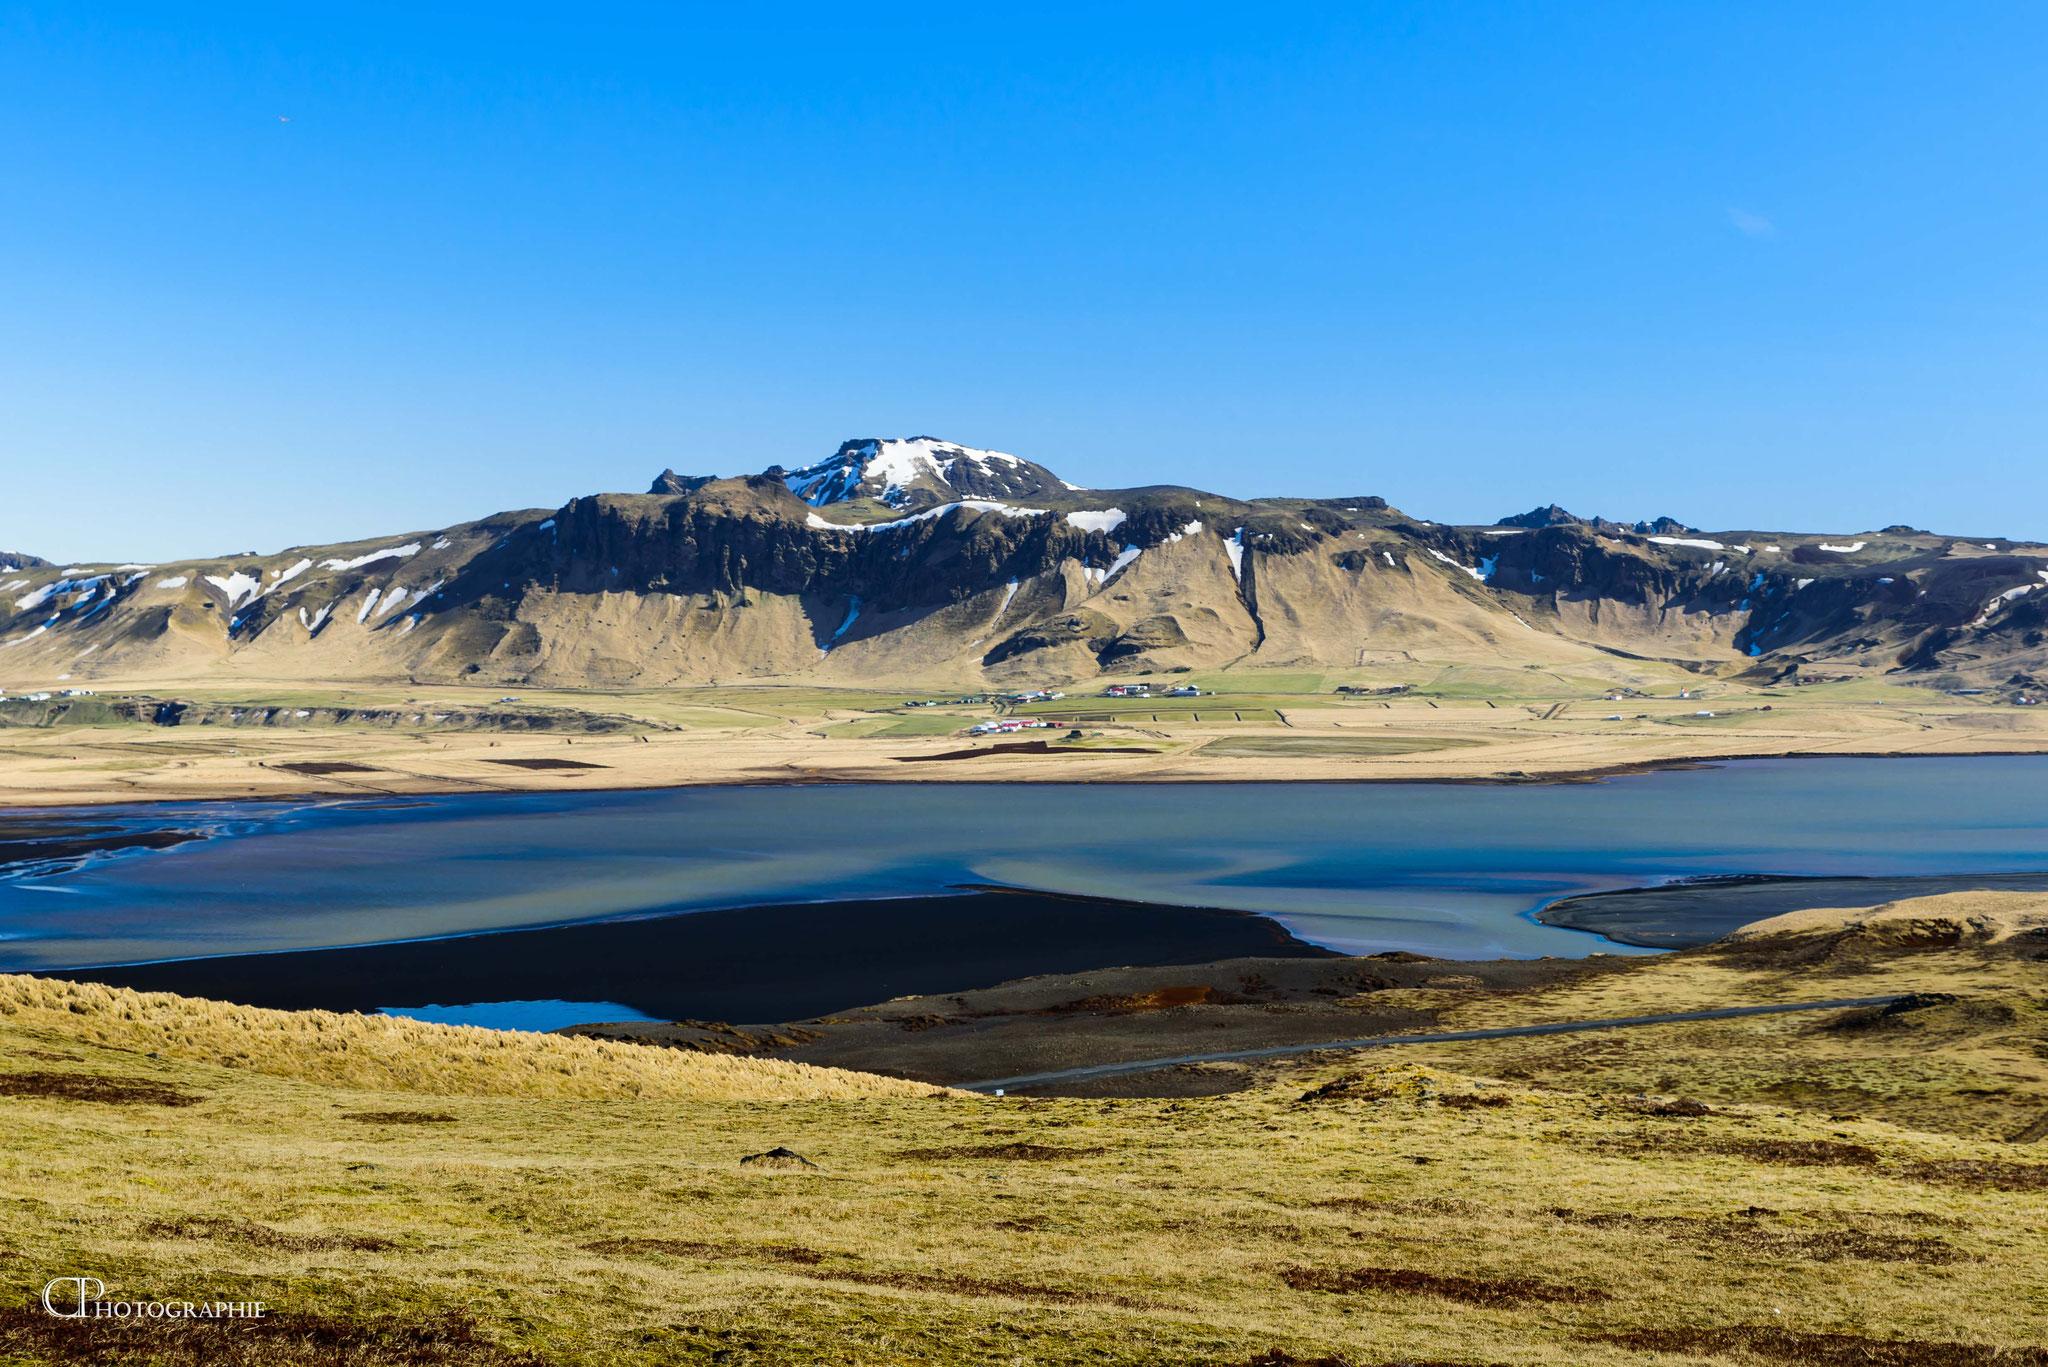 Photo 12 - Le lac polychrome